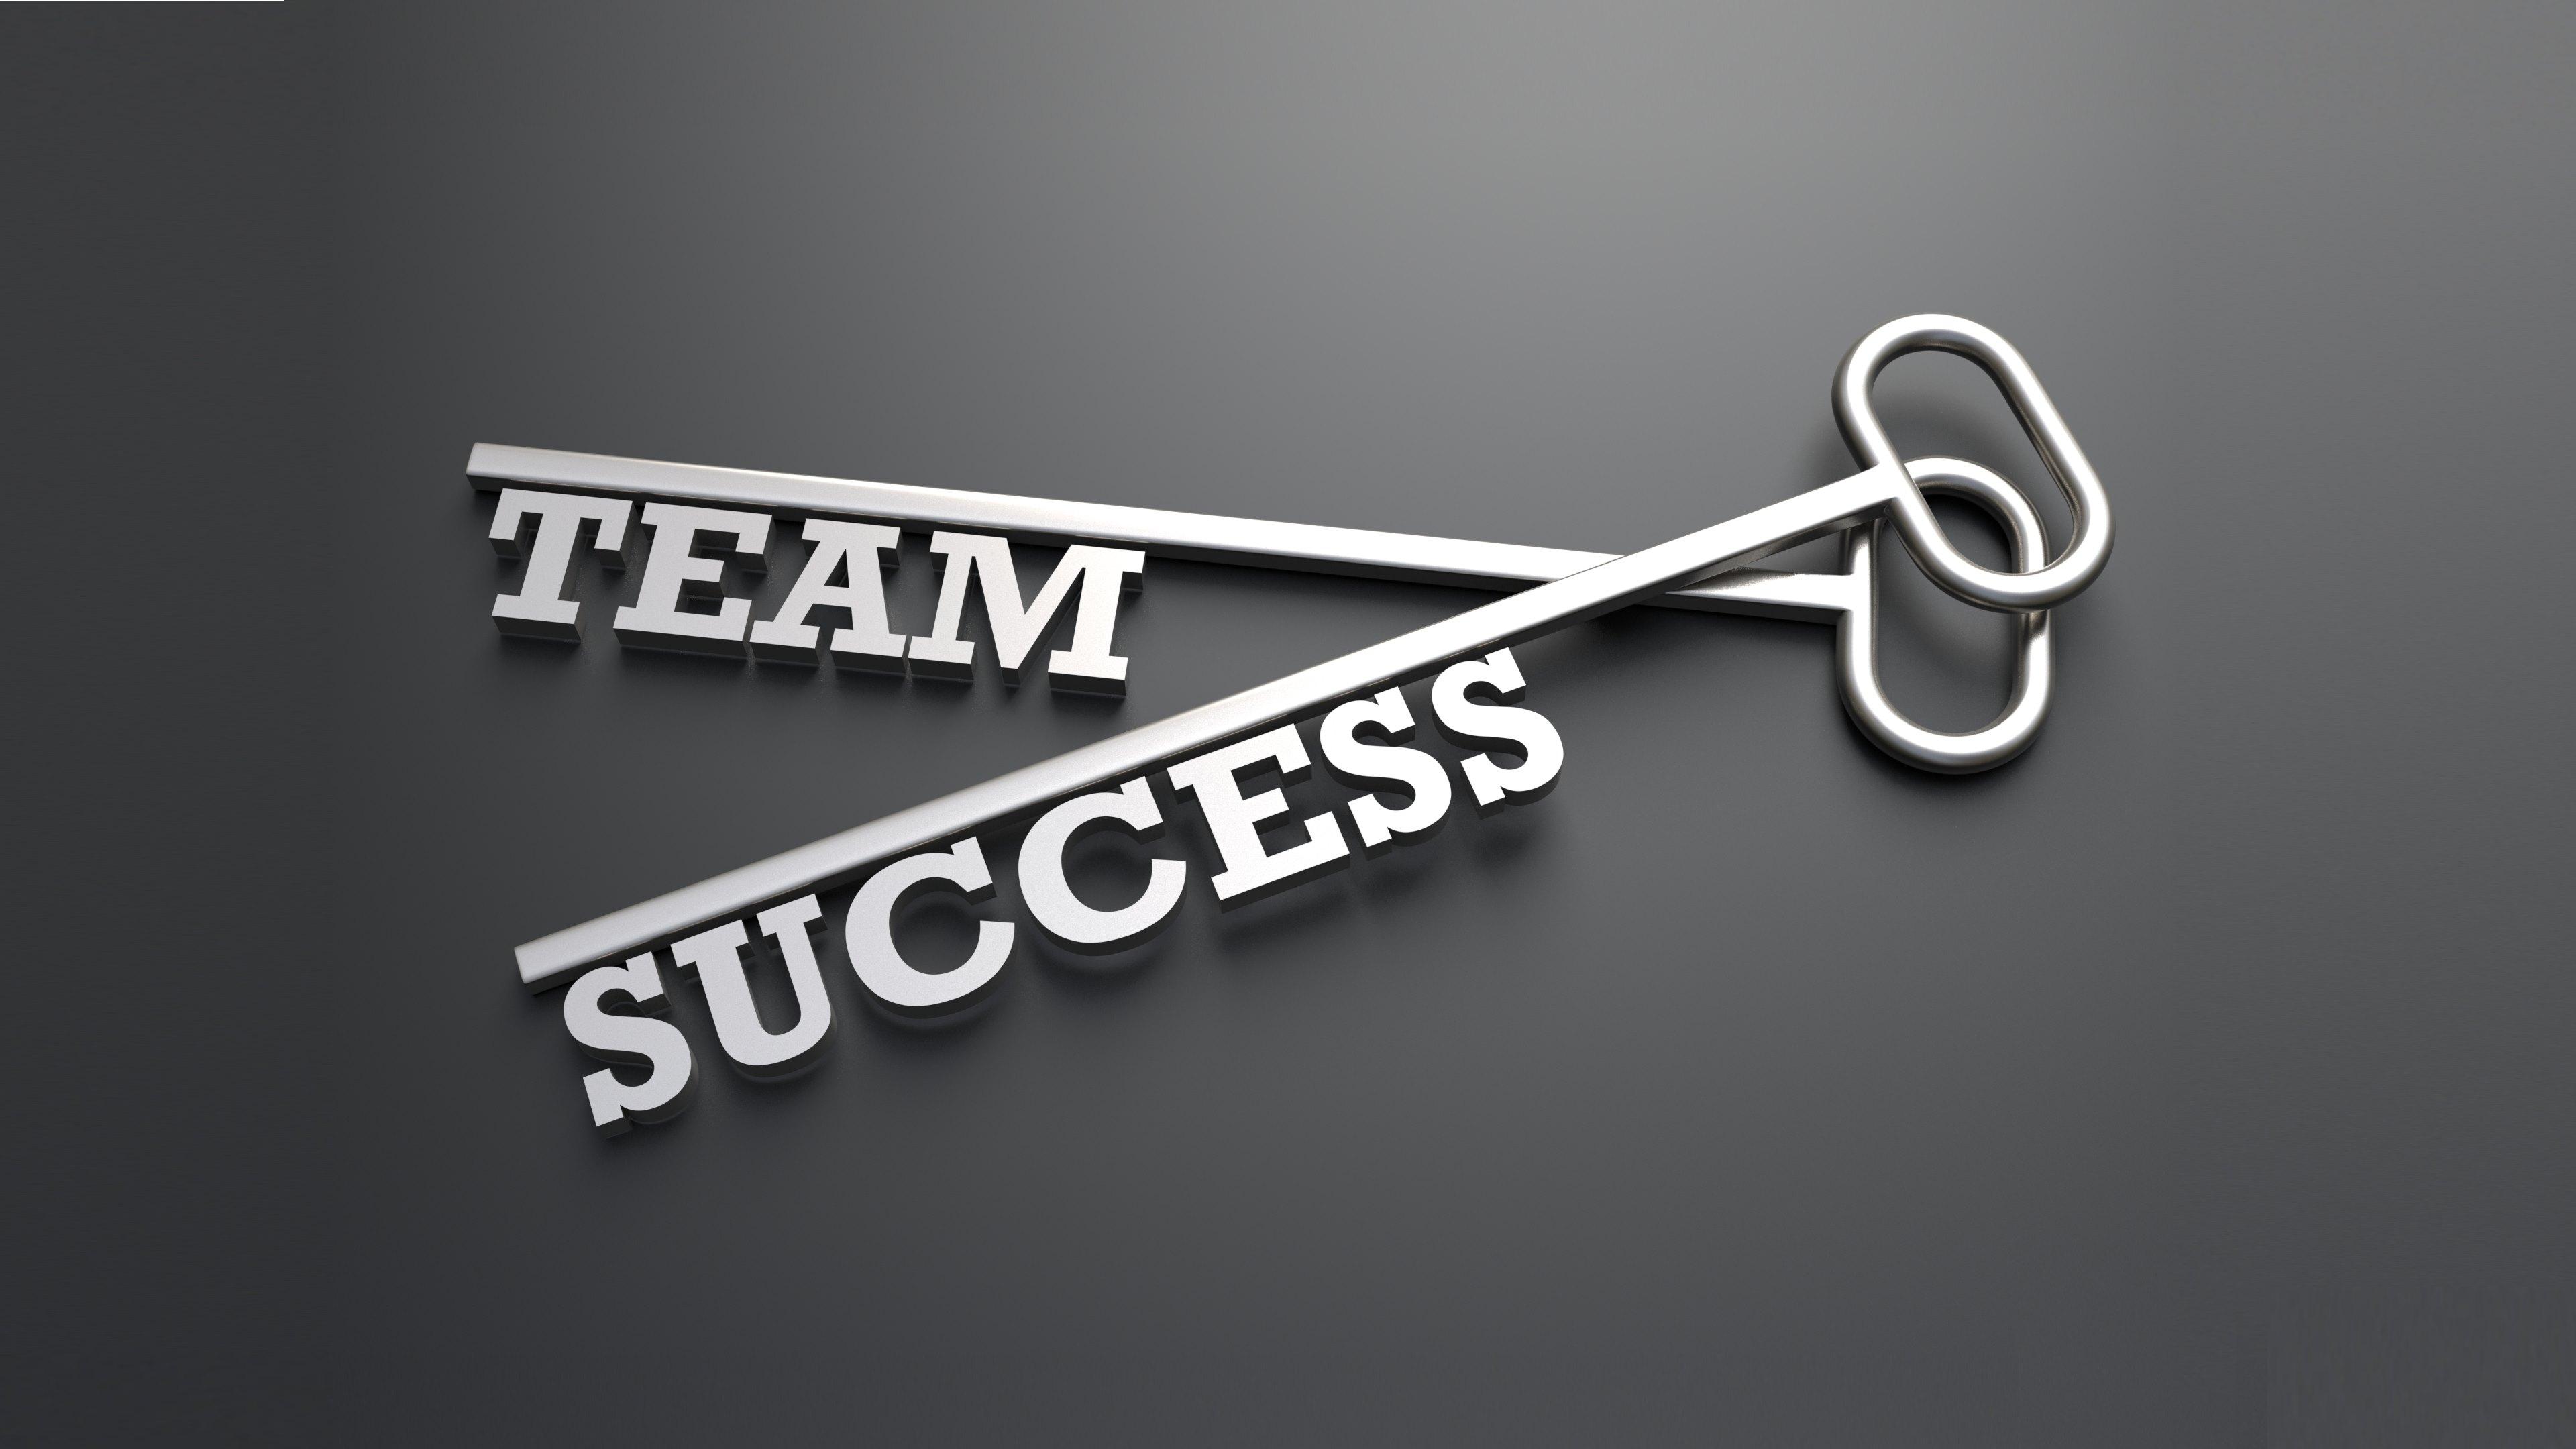 Free Download Teamwork Motivation Team Success Hd Wallpapers 4k Wallpapers 3840x2160 For Your Desktop Mobile Tablet Explore 43 Success Hd Wallpaper Positive Message Wallpaper Success Wallpapers With Quotes Motivational